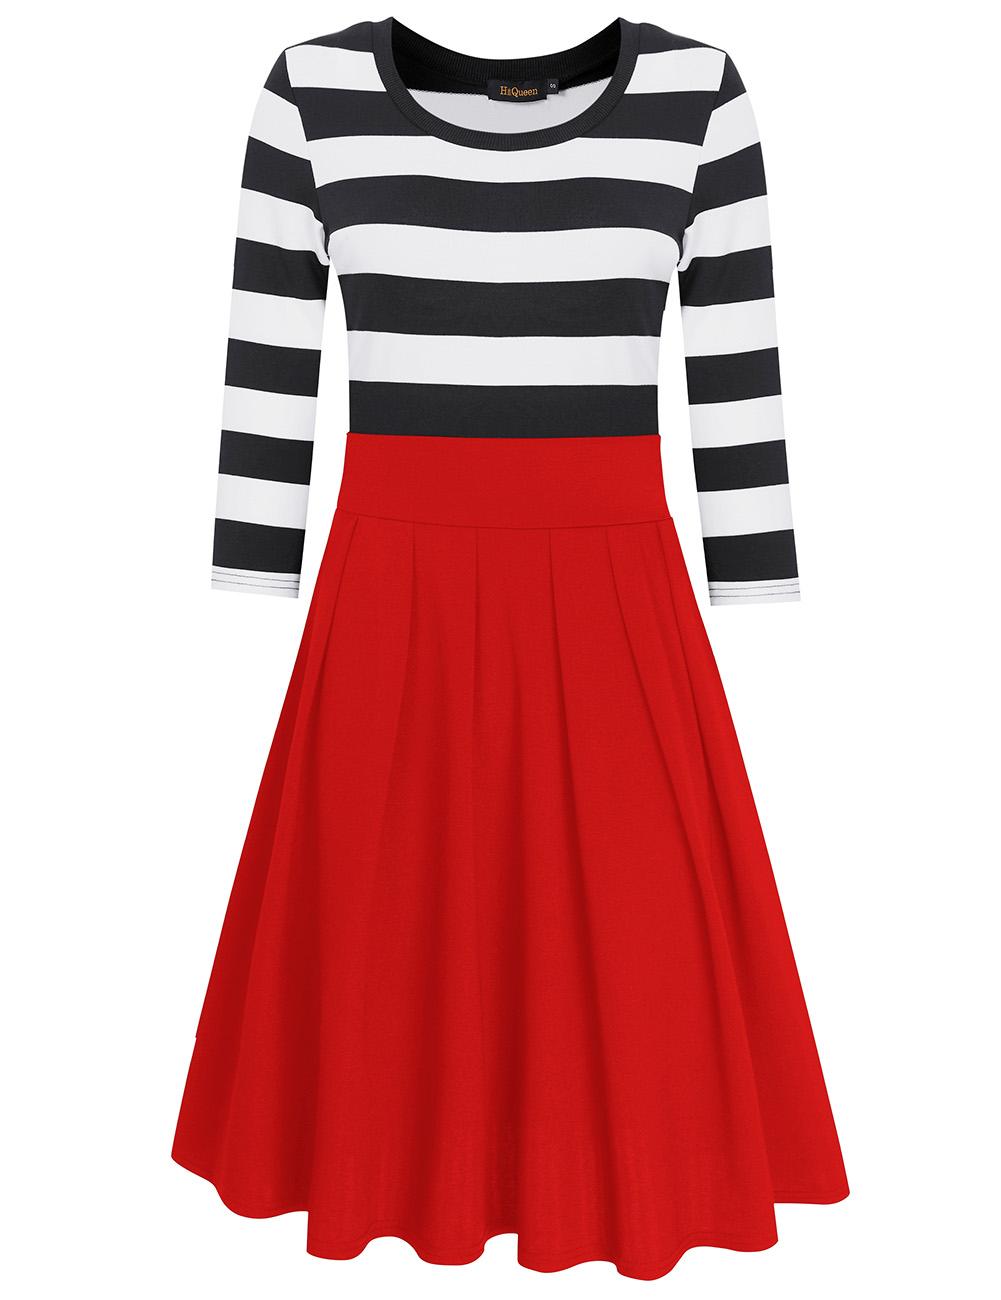 HiQueen Women Casual Scoop Neck 3/4 Sleeve A-Line Swing Dress Stripe Modest Dresses Red_S